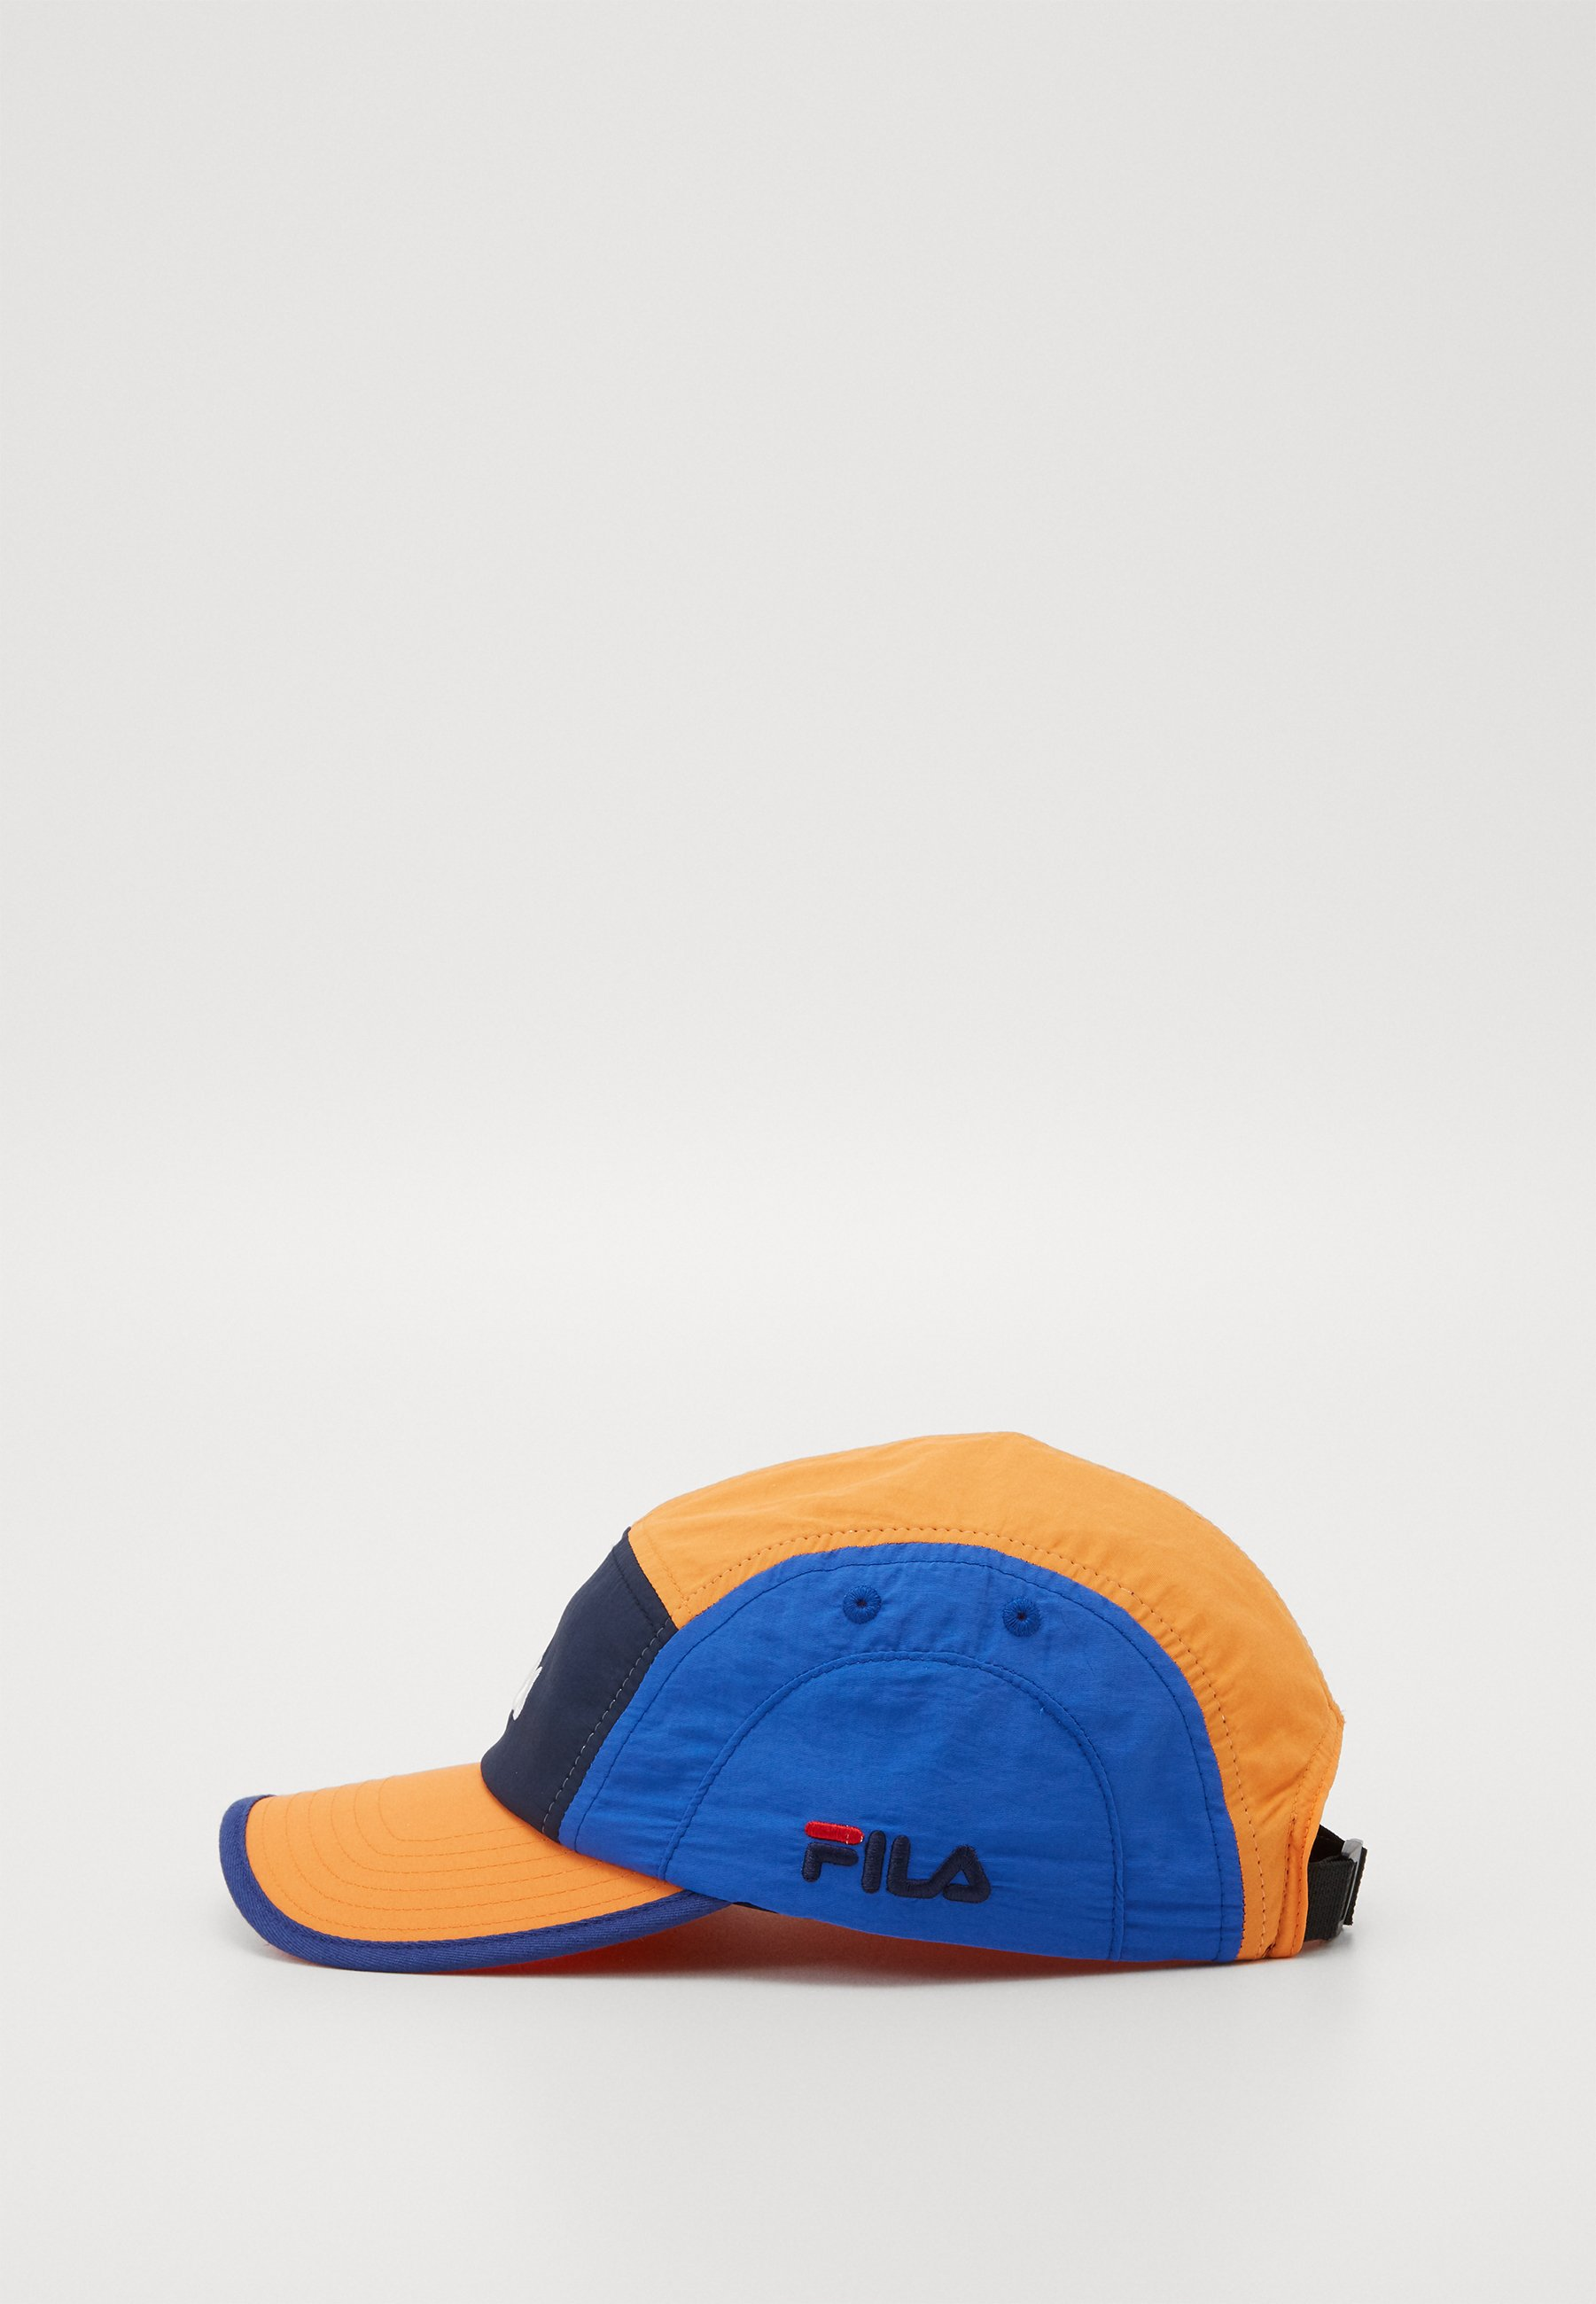 Fila RETRO TRAIL WITH LINEAR LOGO - Cap - orange popsicle/dazzling blue/black iris/oransje cr1YS83PsfpciC1